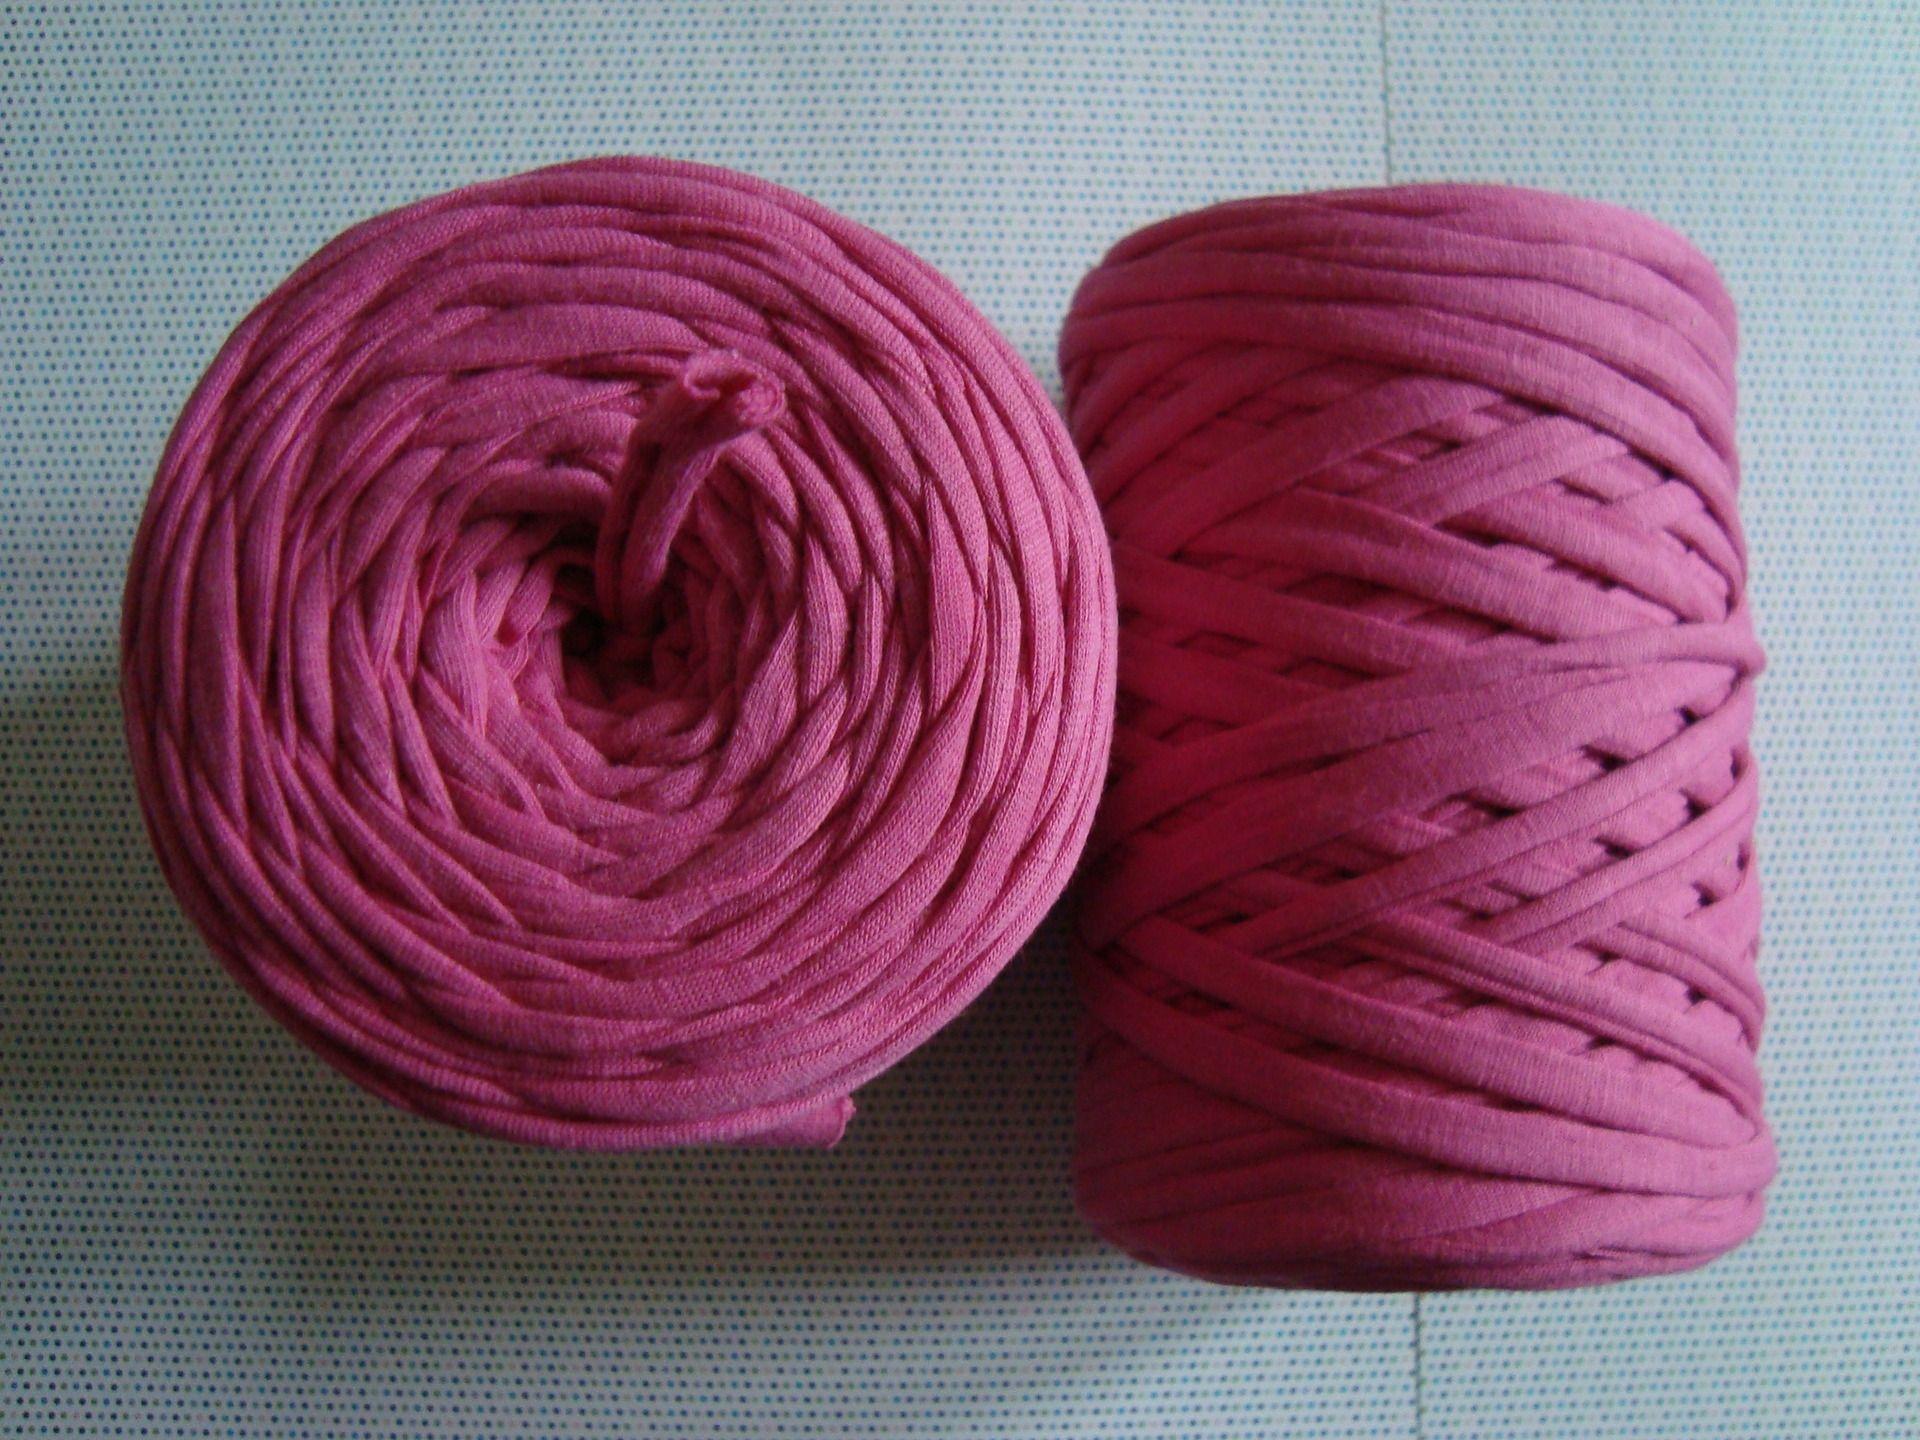 1 Pelote Bobine De Fil Ruban Jersey Hooked Zpagetti A Tricoter Ou Crocheter Elastique Resistant Et Durable Issu Du Recyclage De T Throw Pillows Pillows Rock